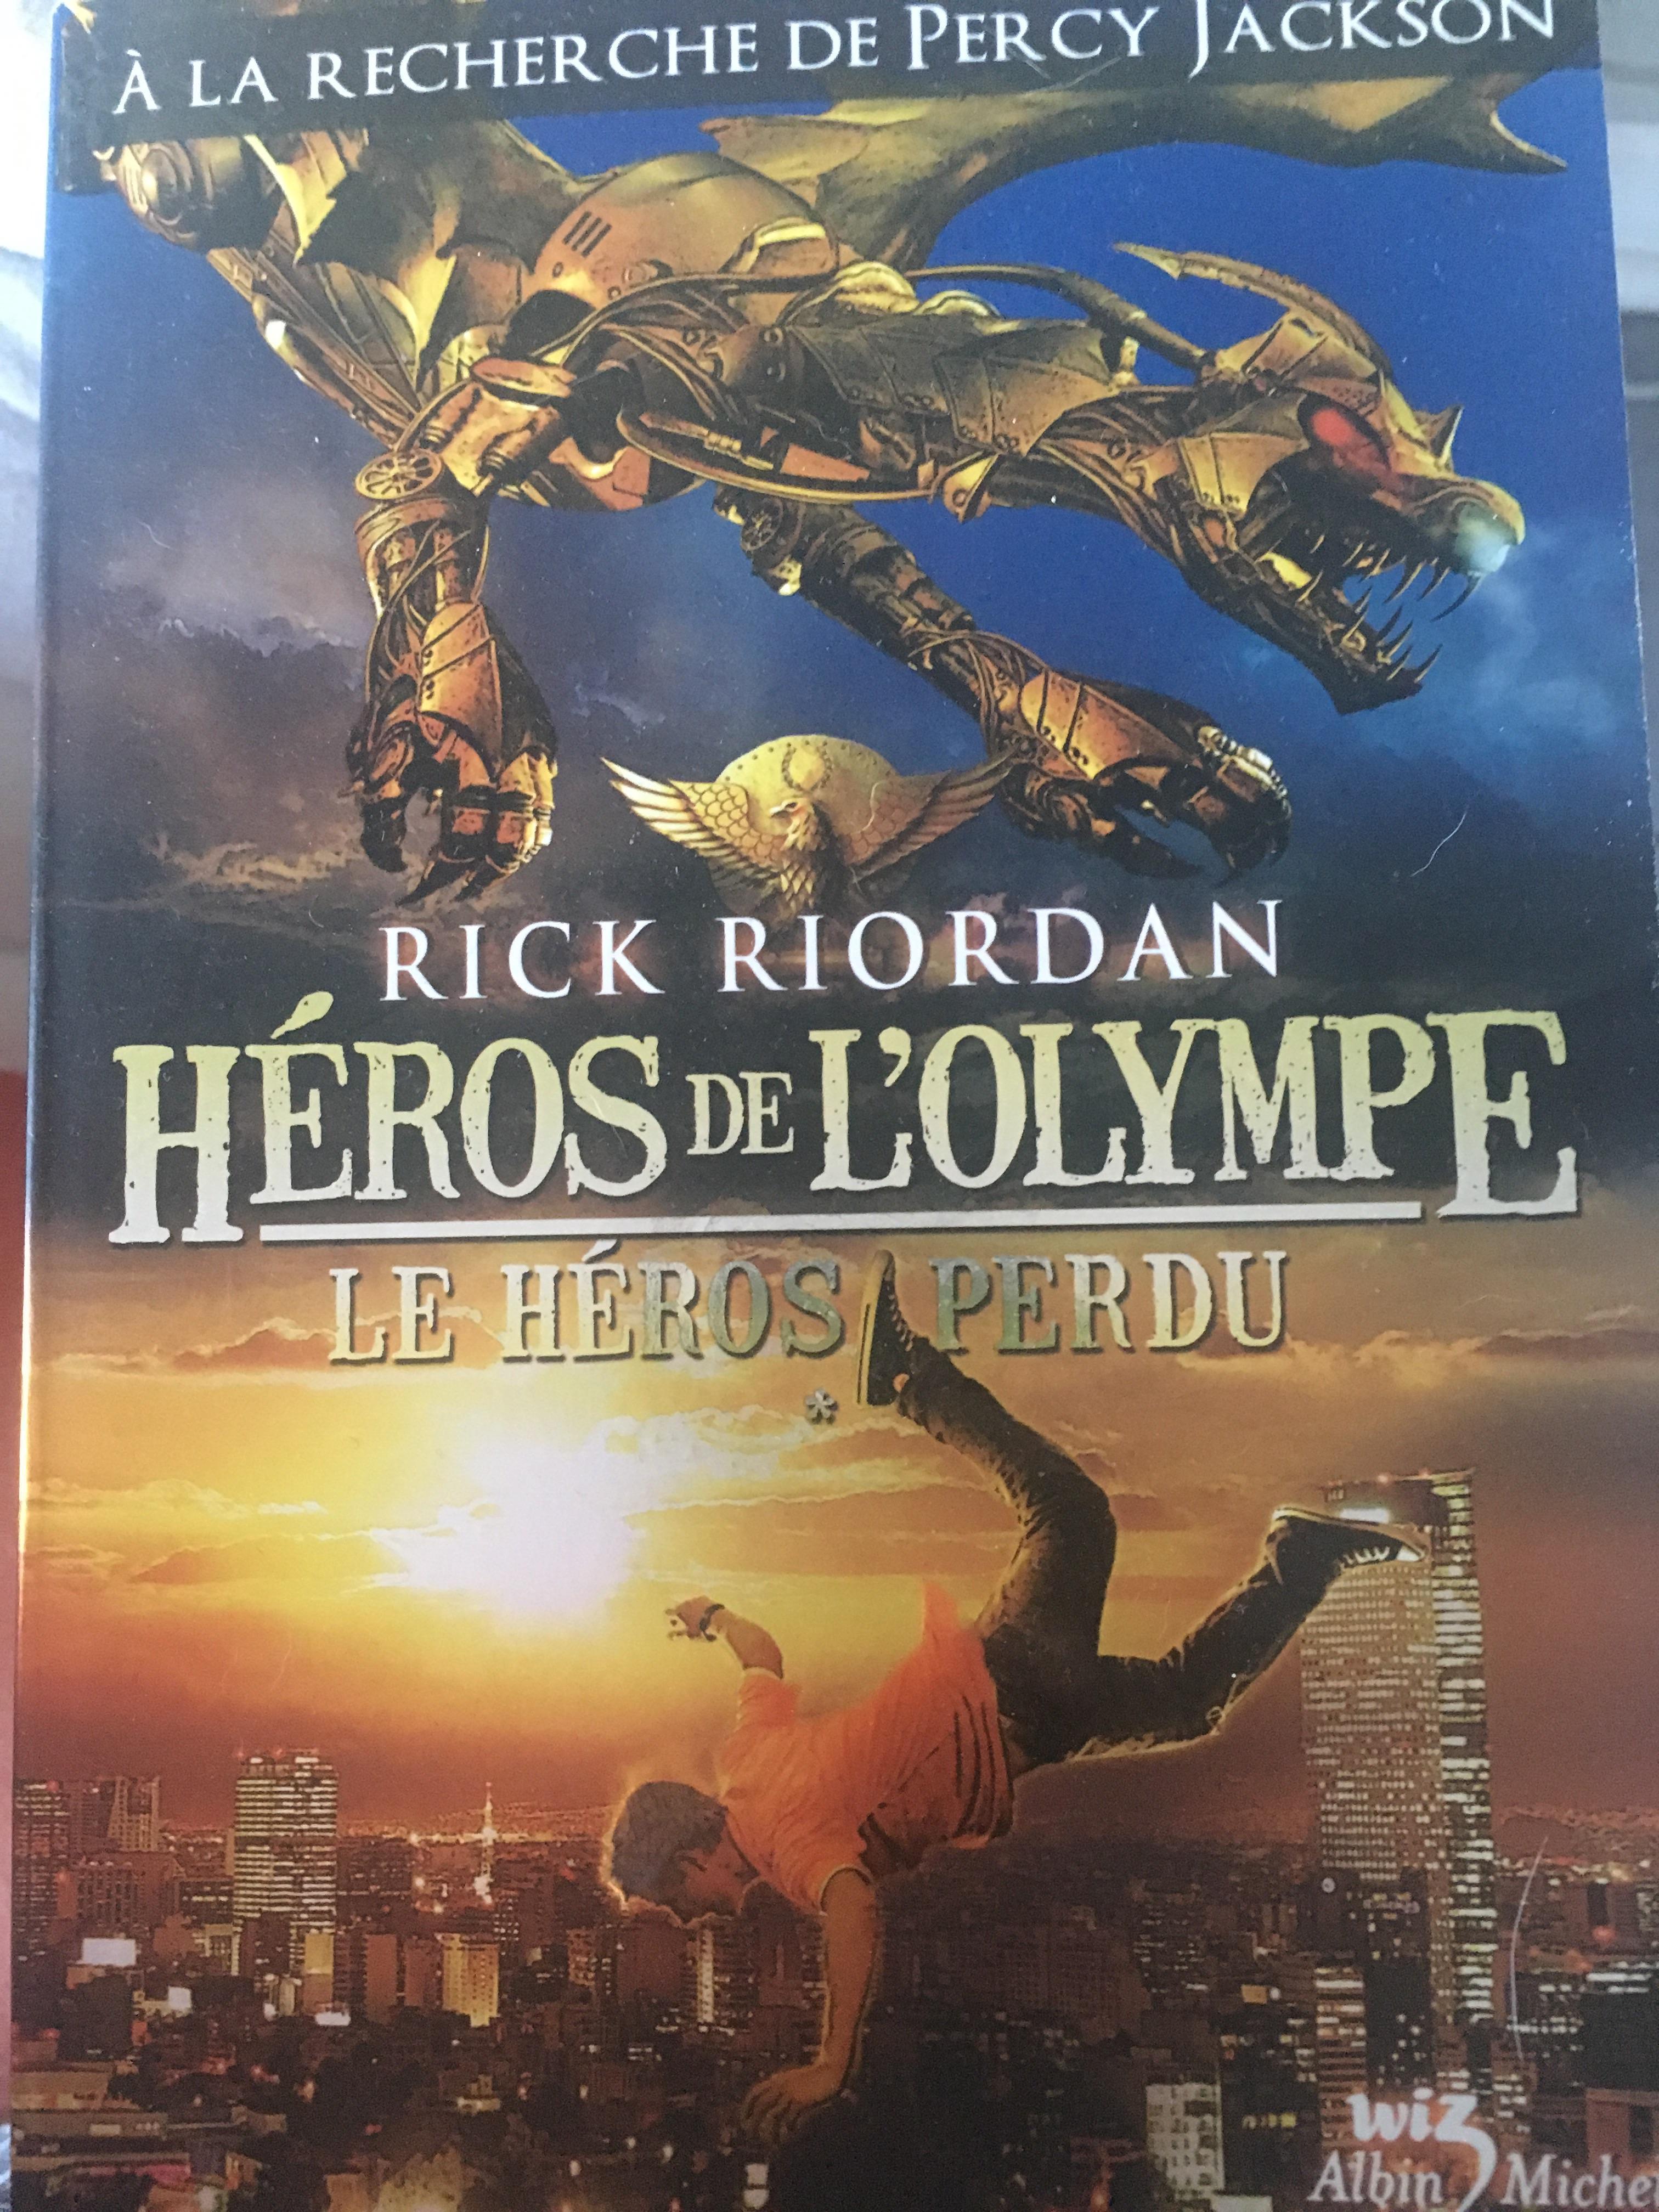 troc de troc livre hero de l'olympe , le héros perdu de rick riordan image 0